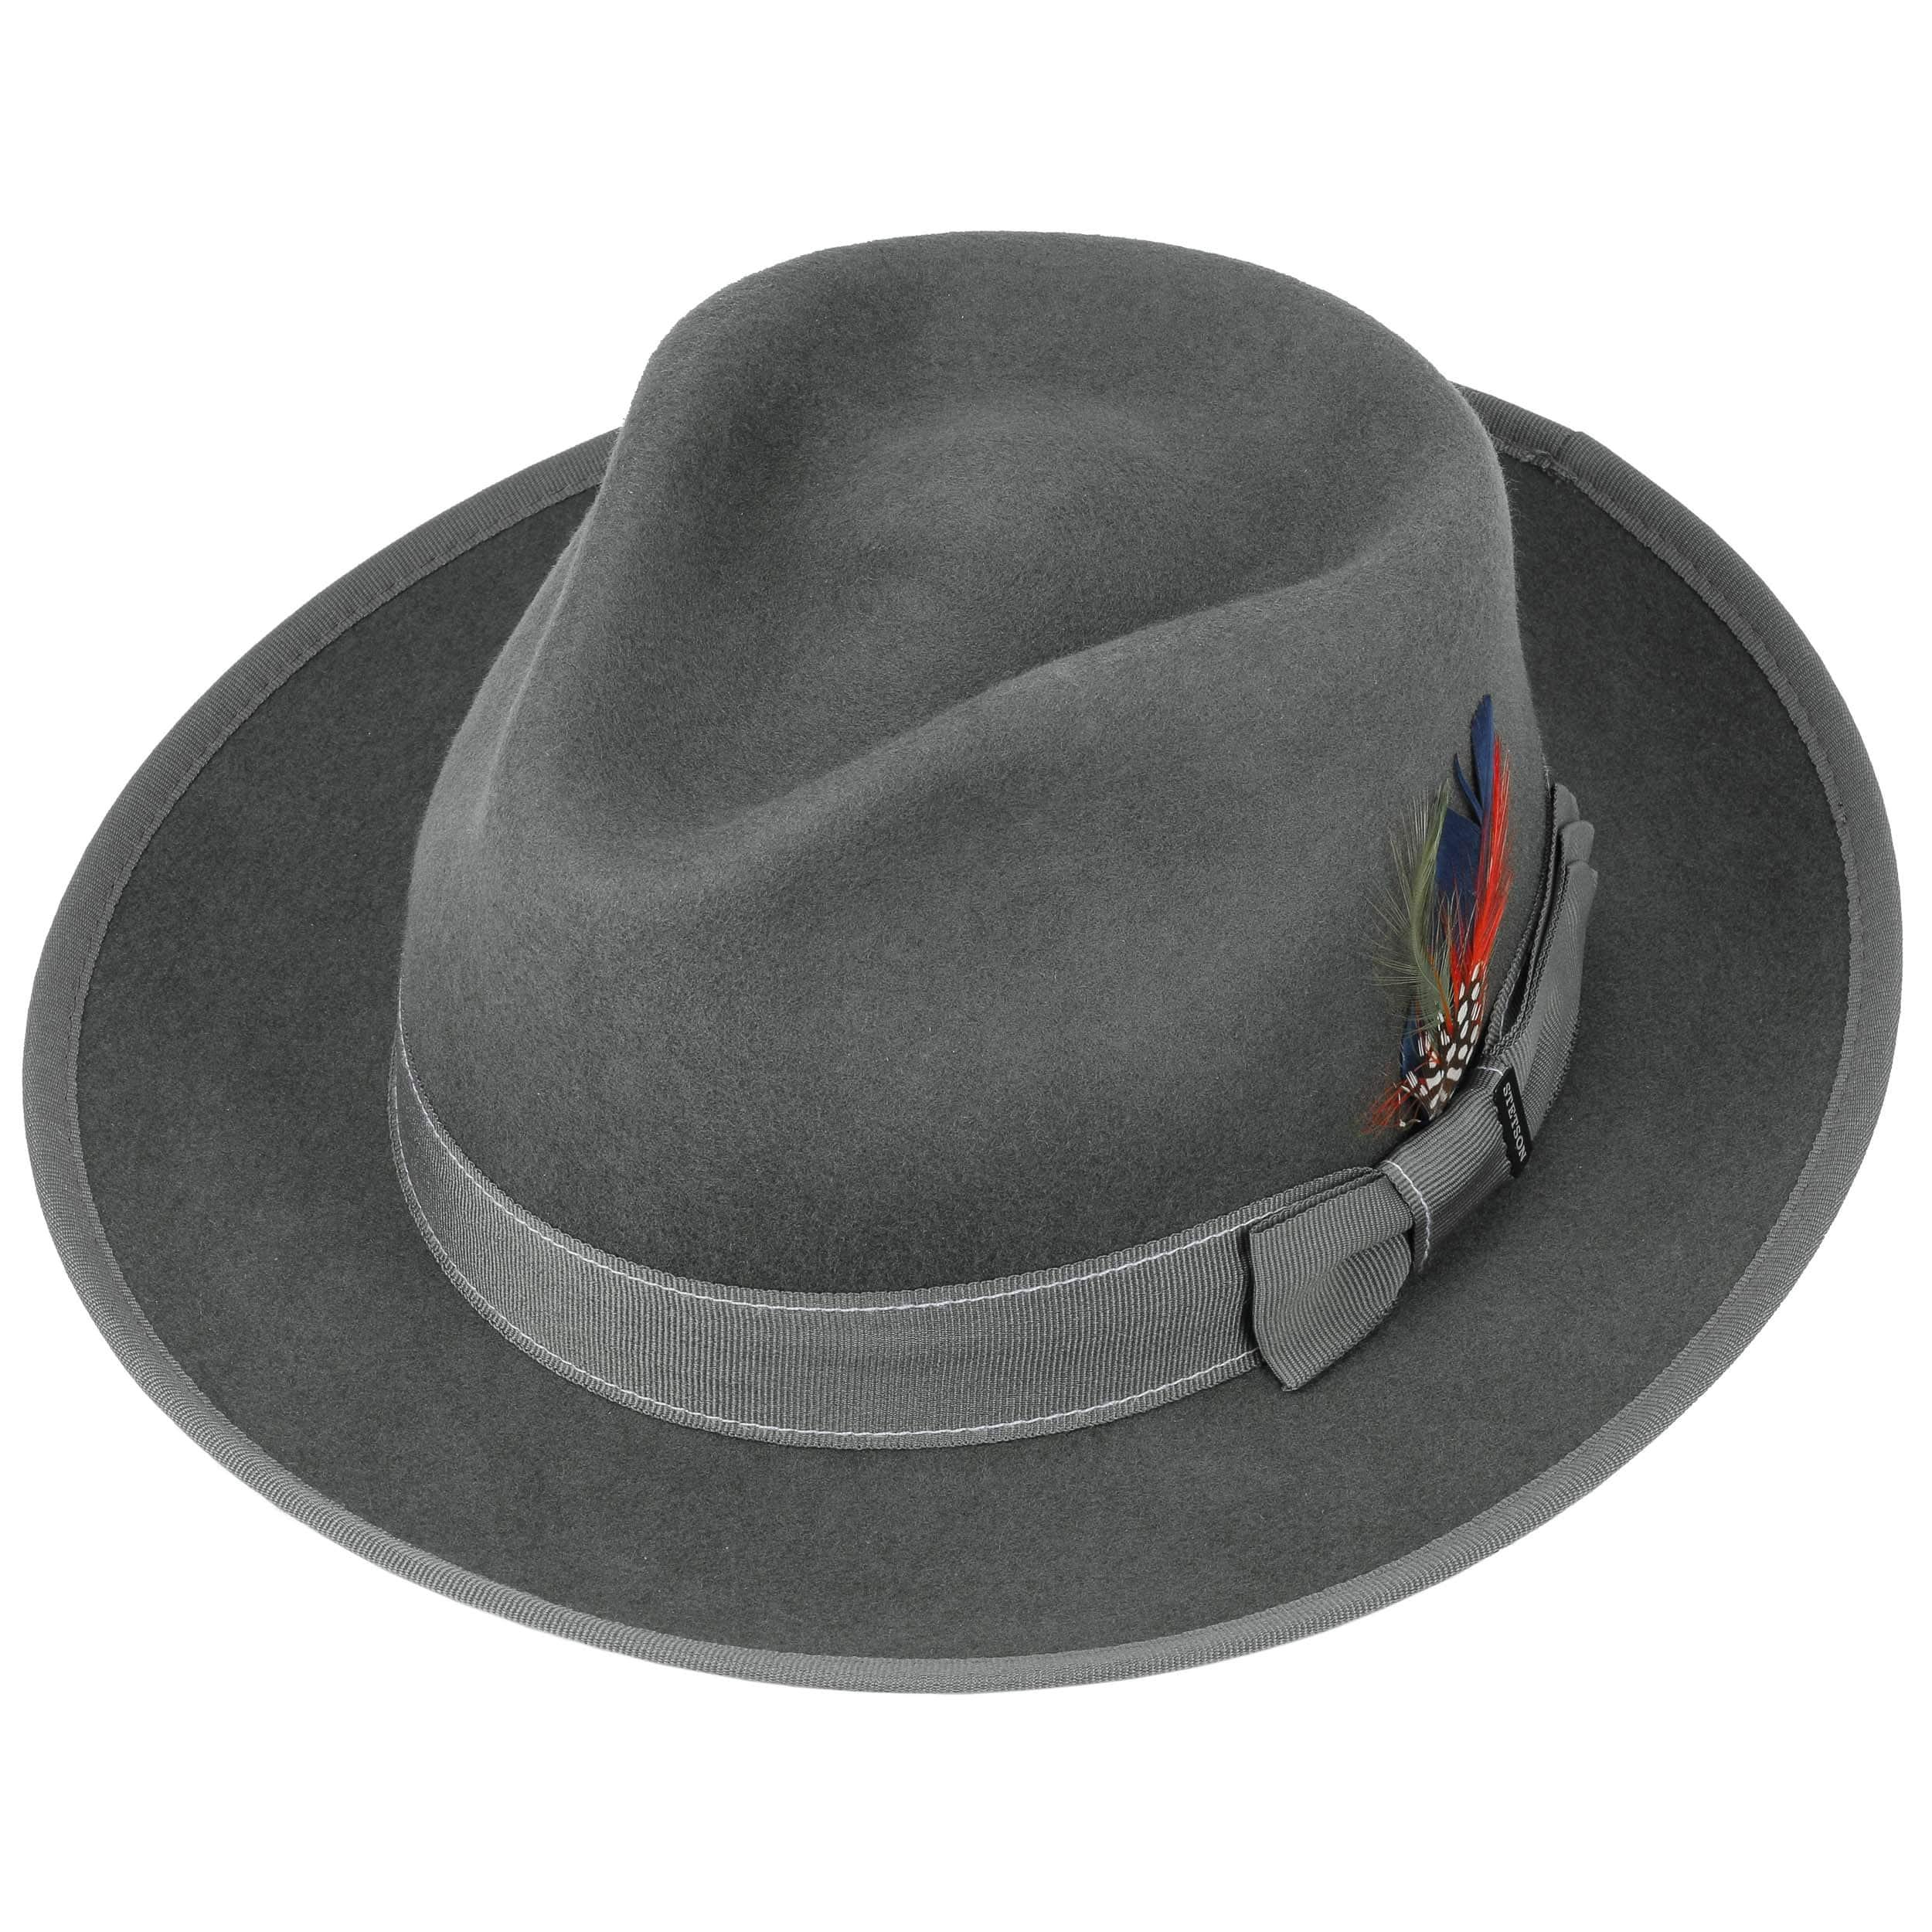 8103a361262443 Virgi Wool Felt Hat by Stetson - grey 1 ...